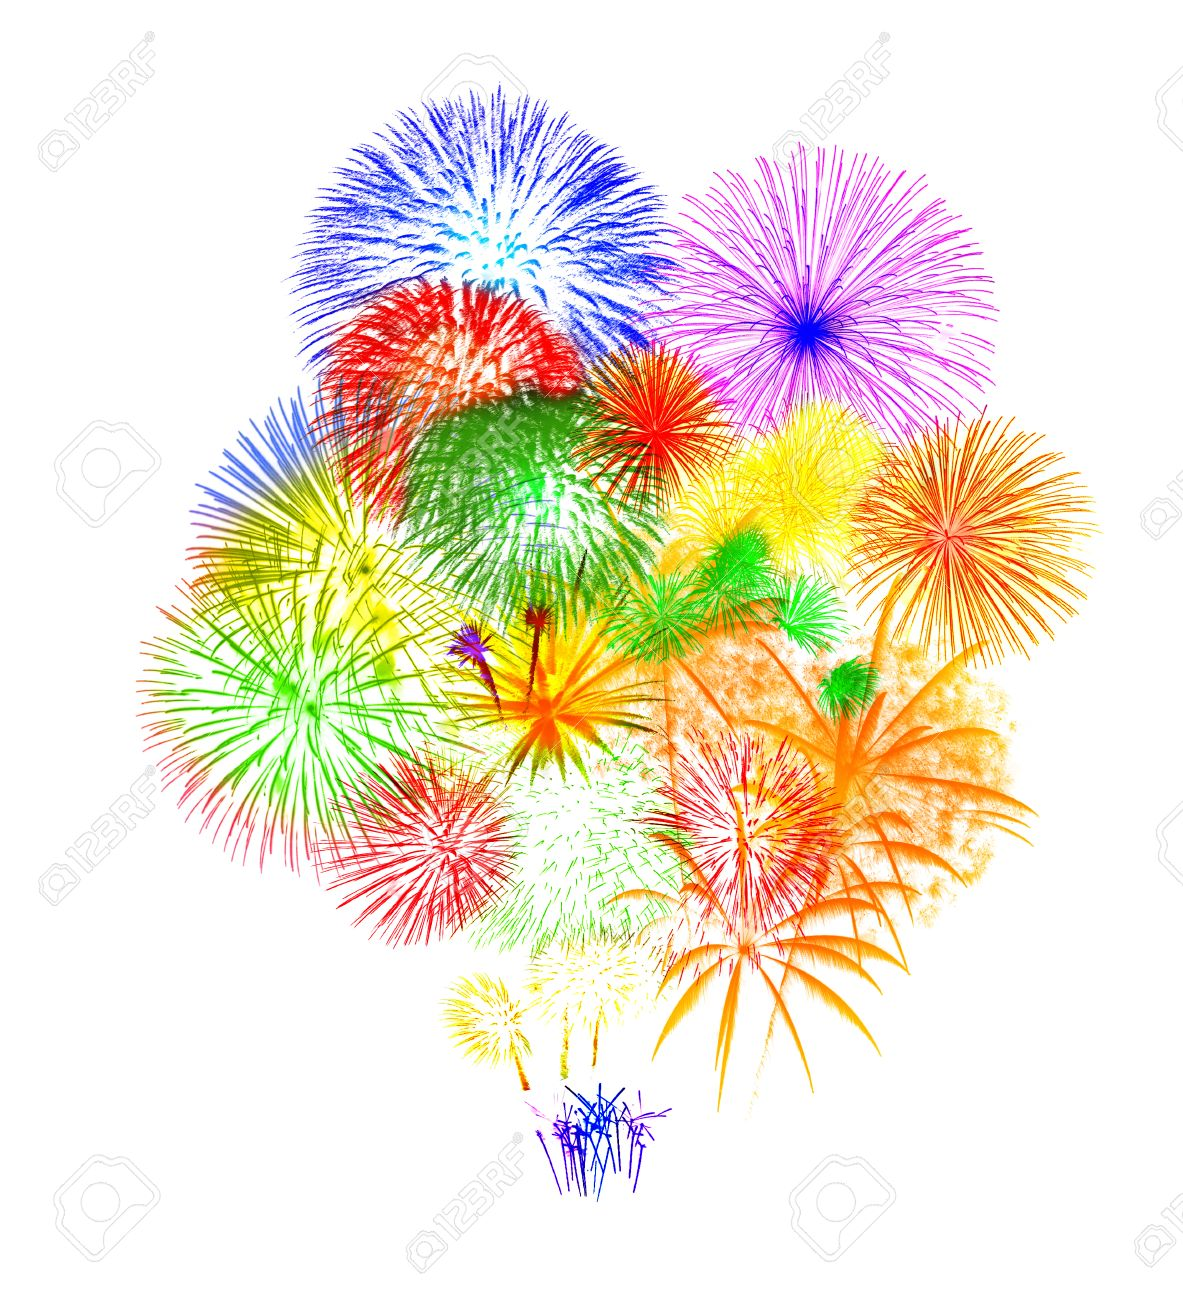 Fireworks on white background Stock Photo - 22907414